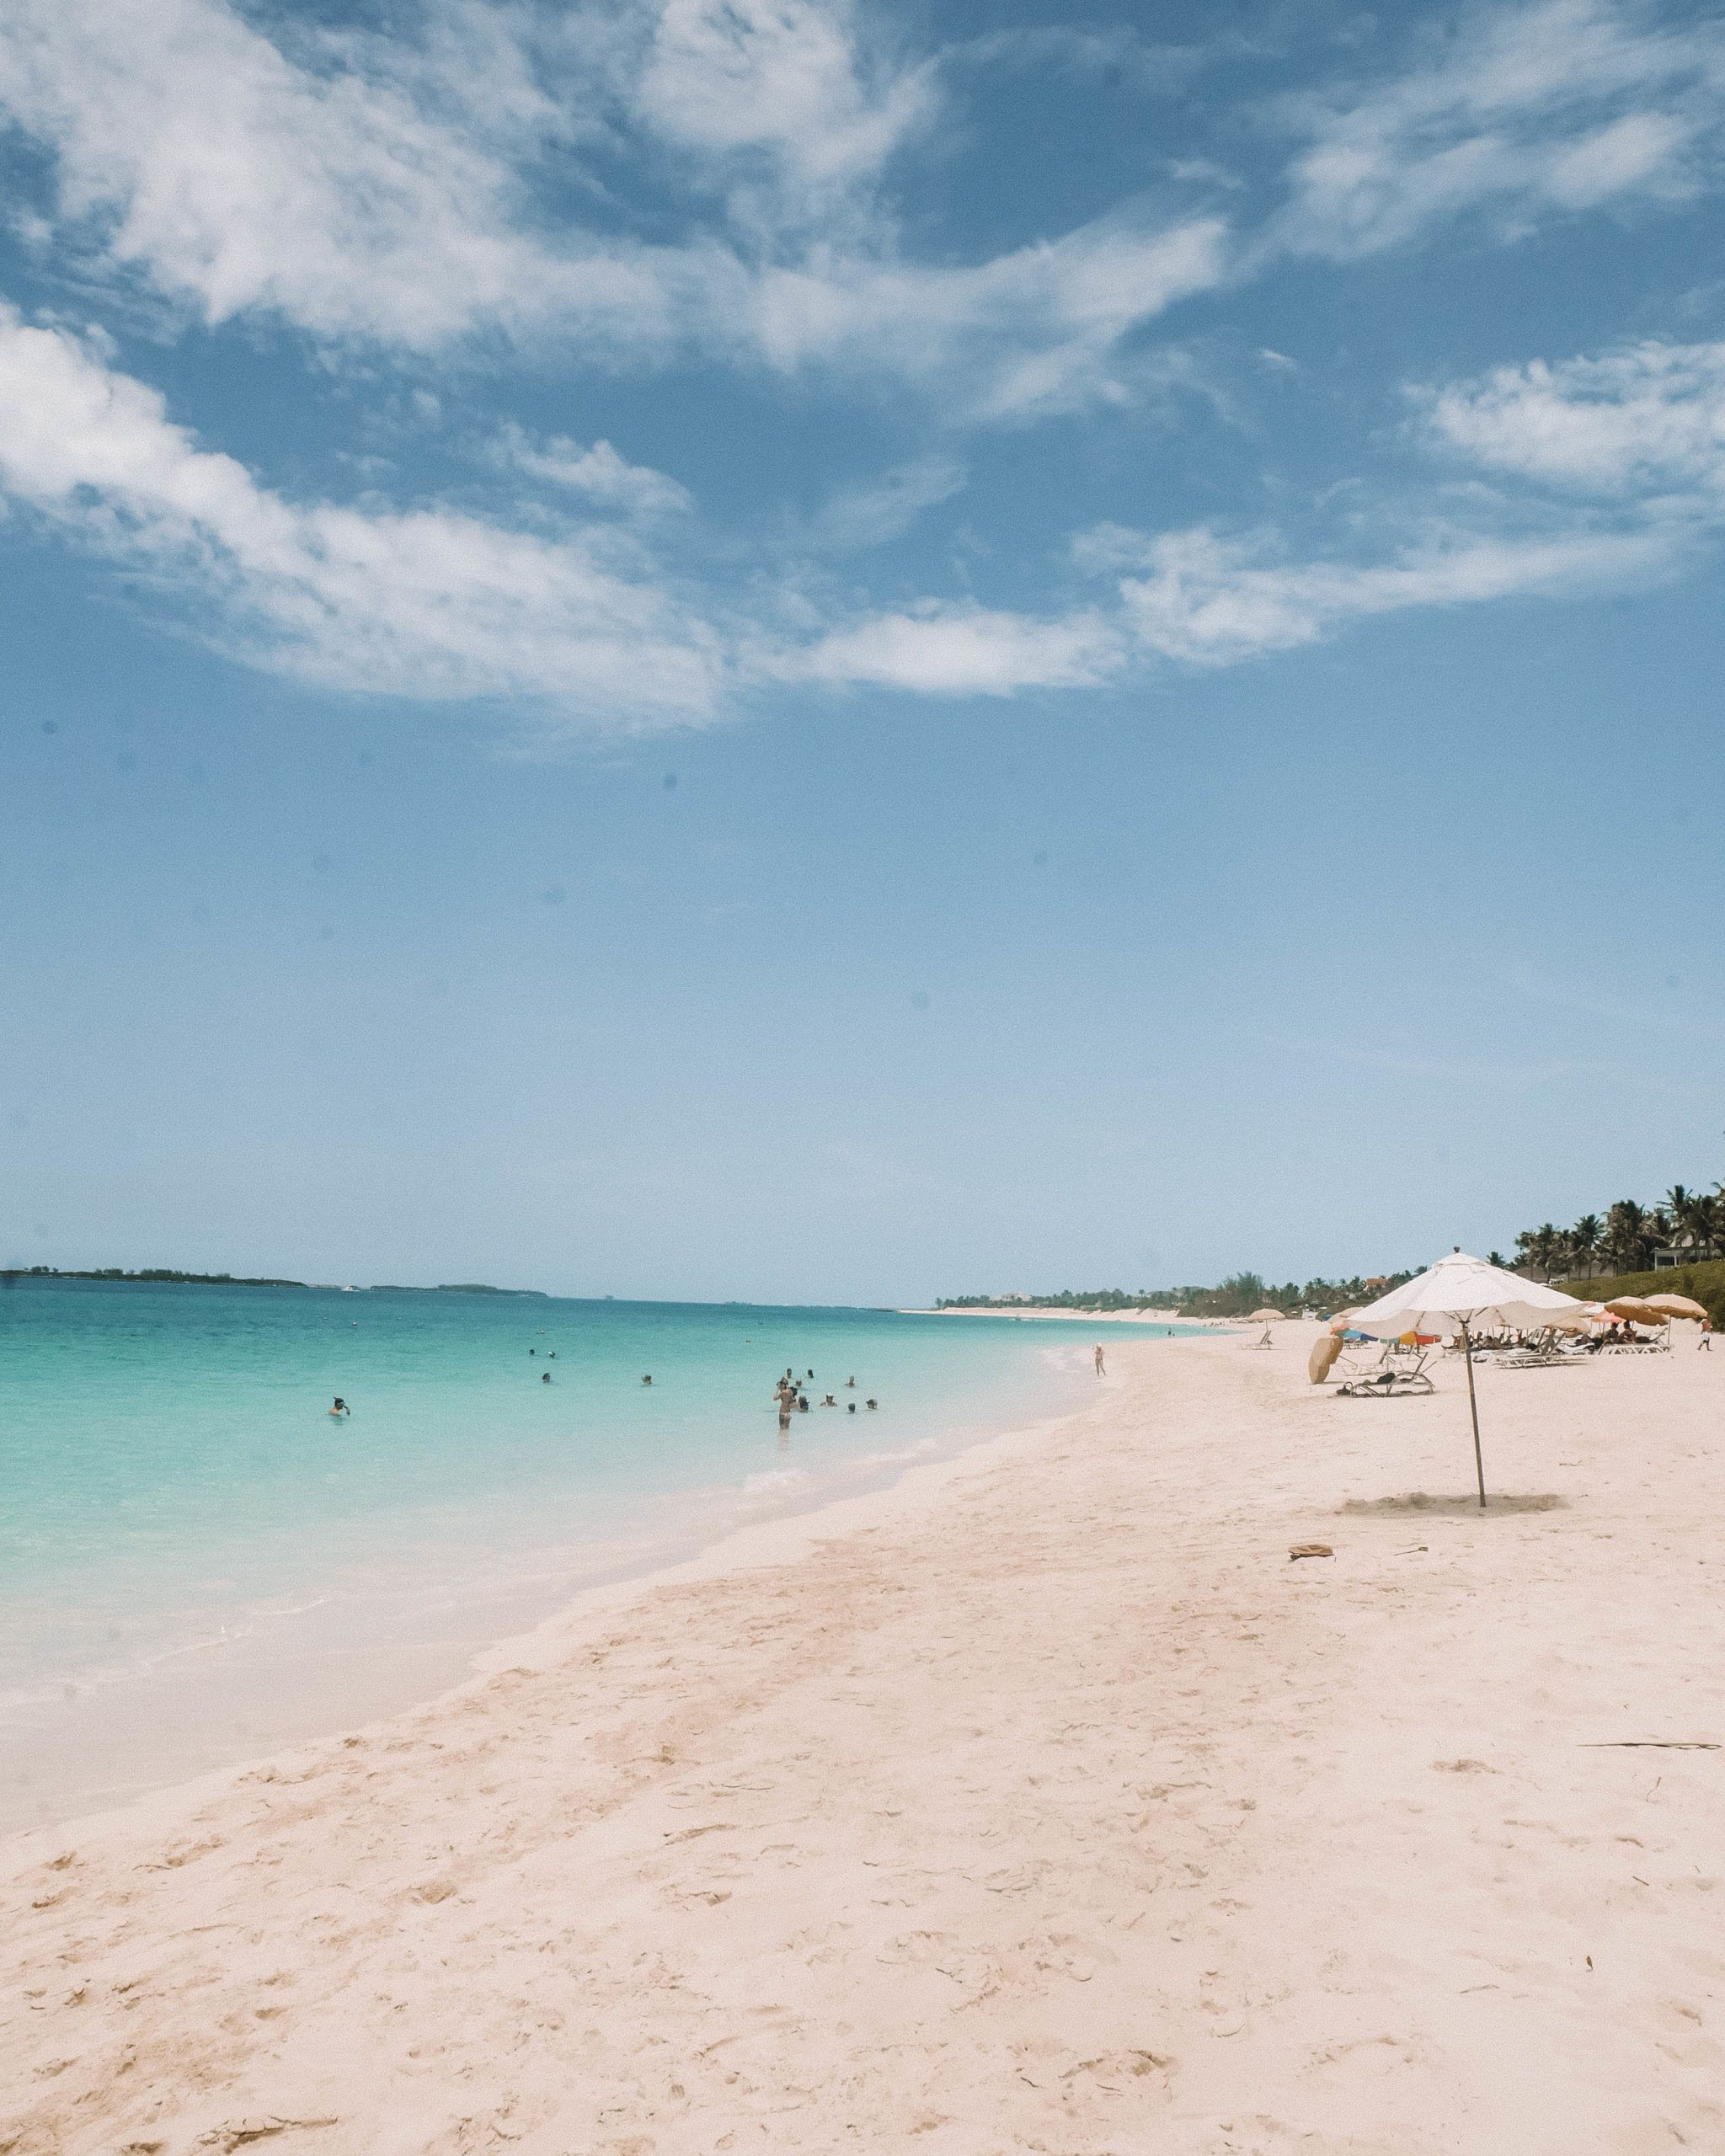 Bahamian paradise the complete guide to nassau bahamas